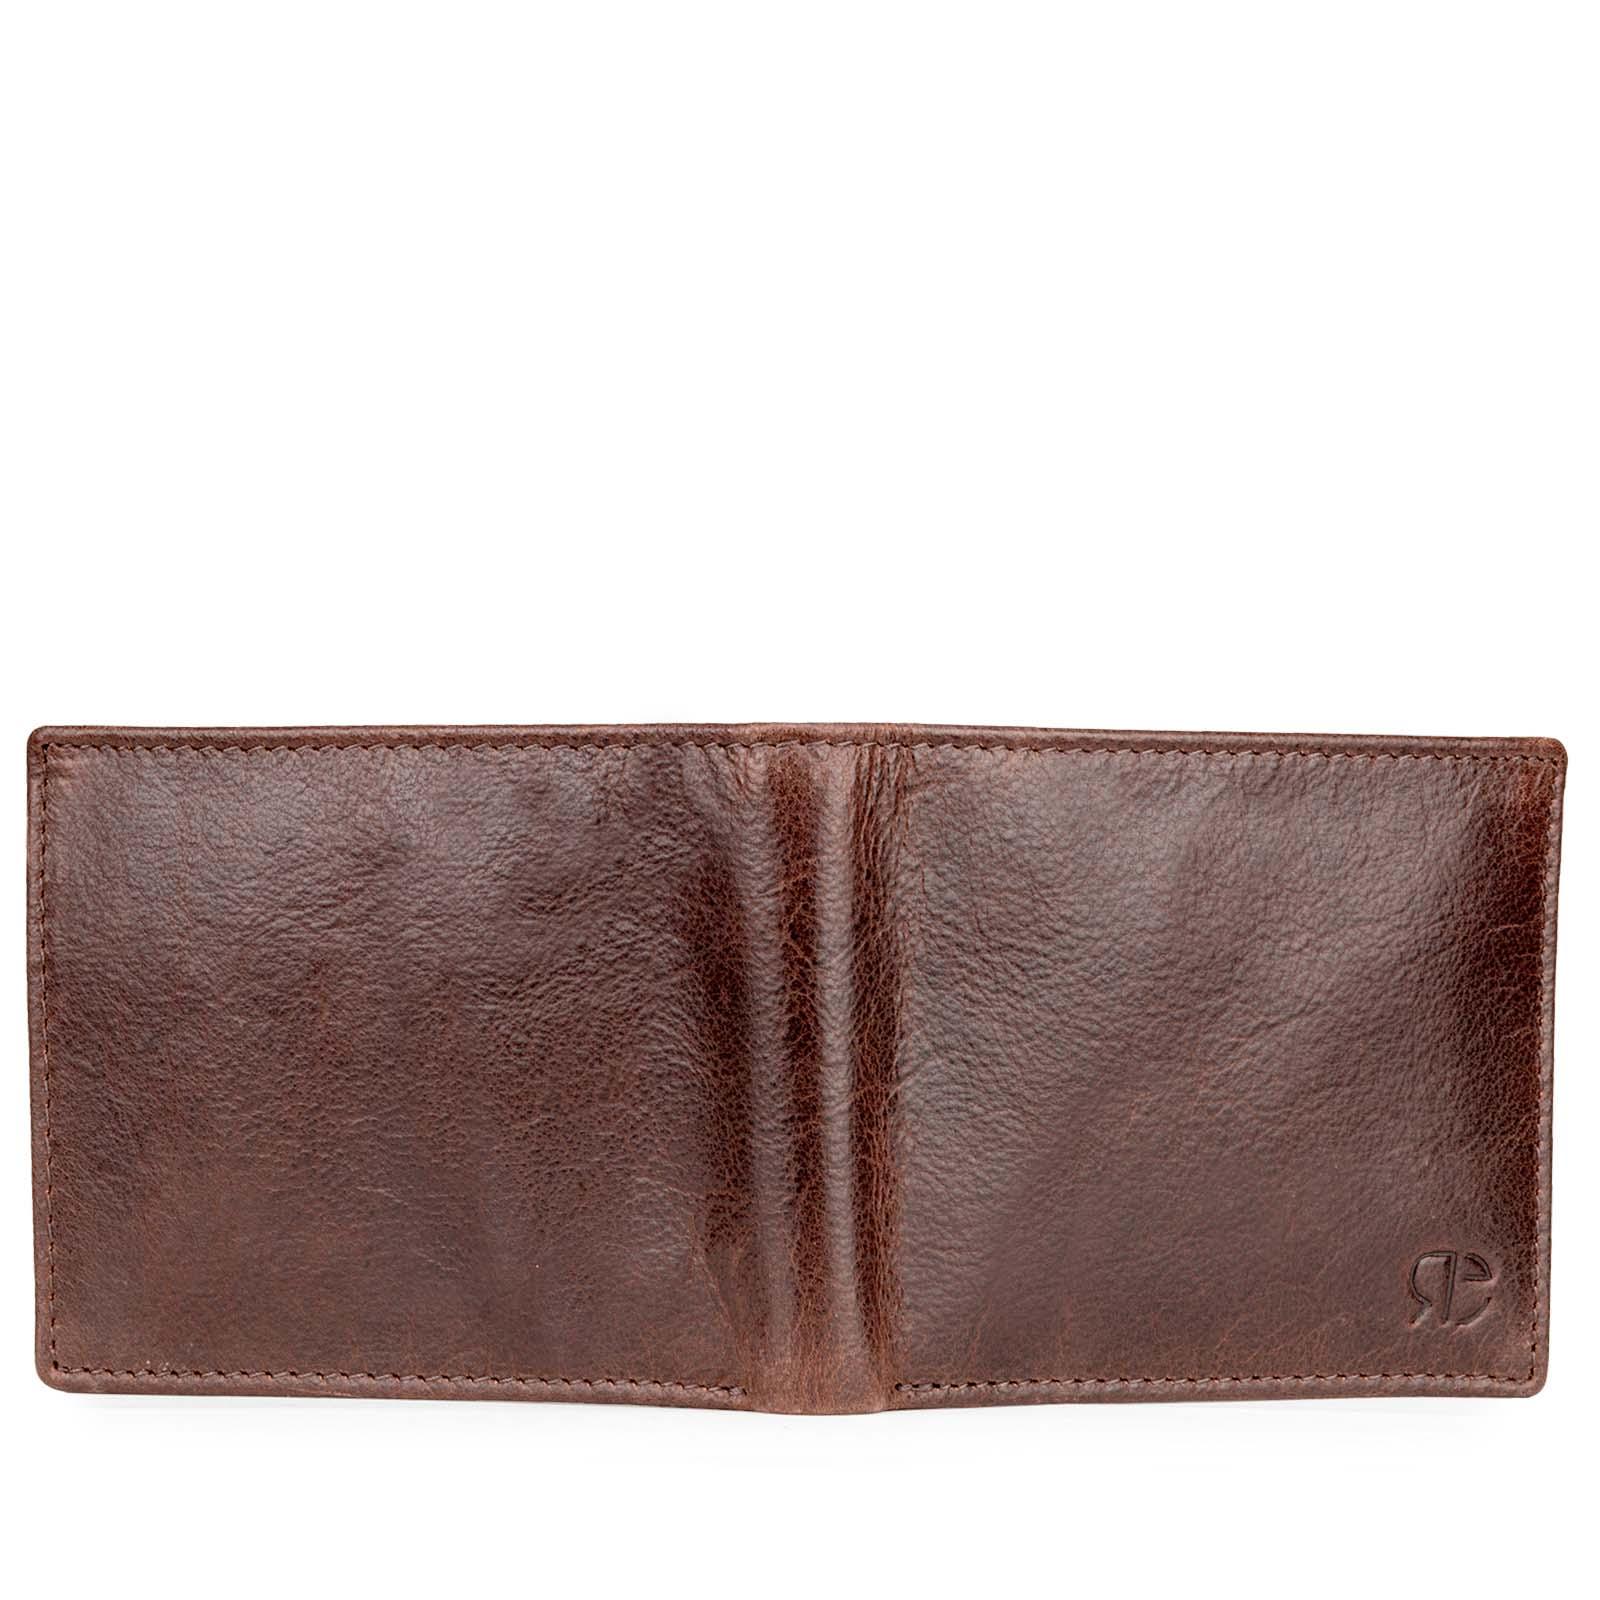 Luxury Brown Textured Leather Men's Wallet